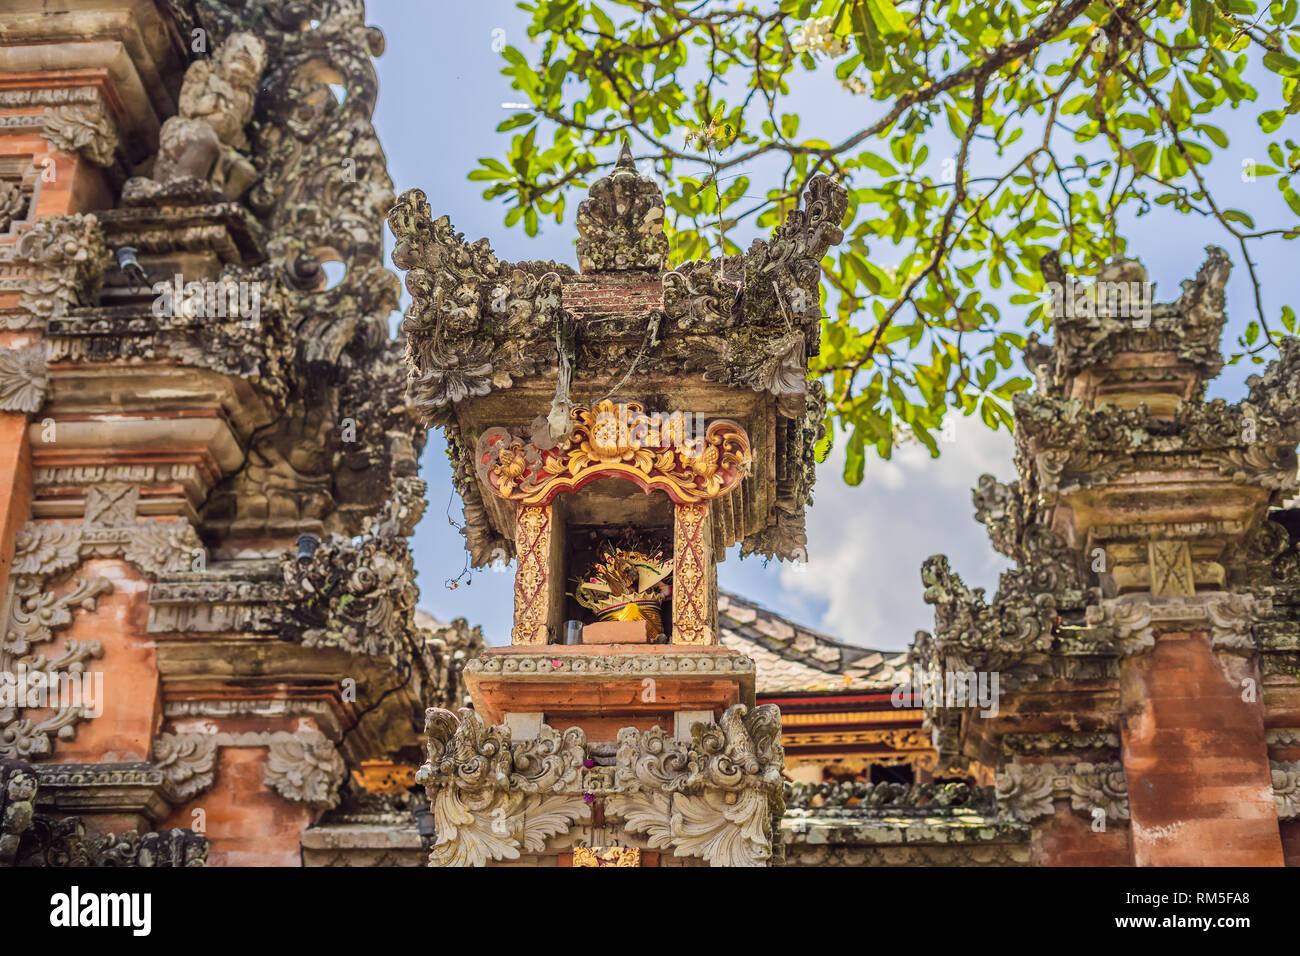 Pura Taman Kemuda Saraswati Temple in Ubud, Bali island, Indonesia - Stock Image